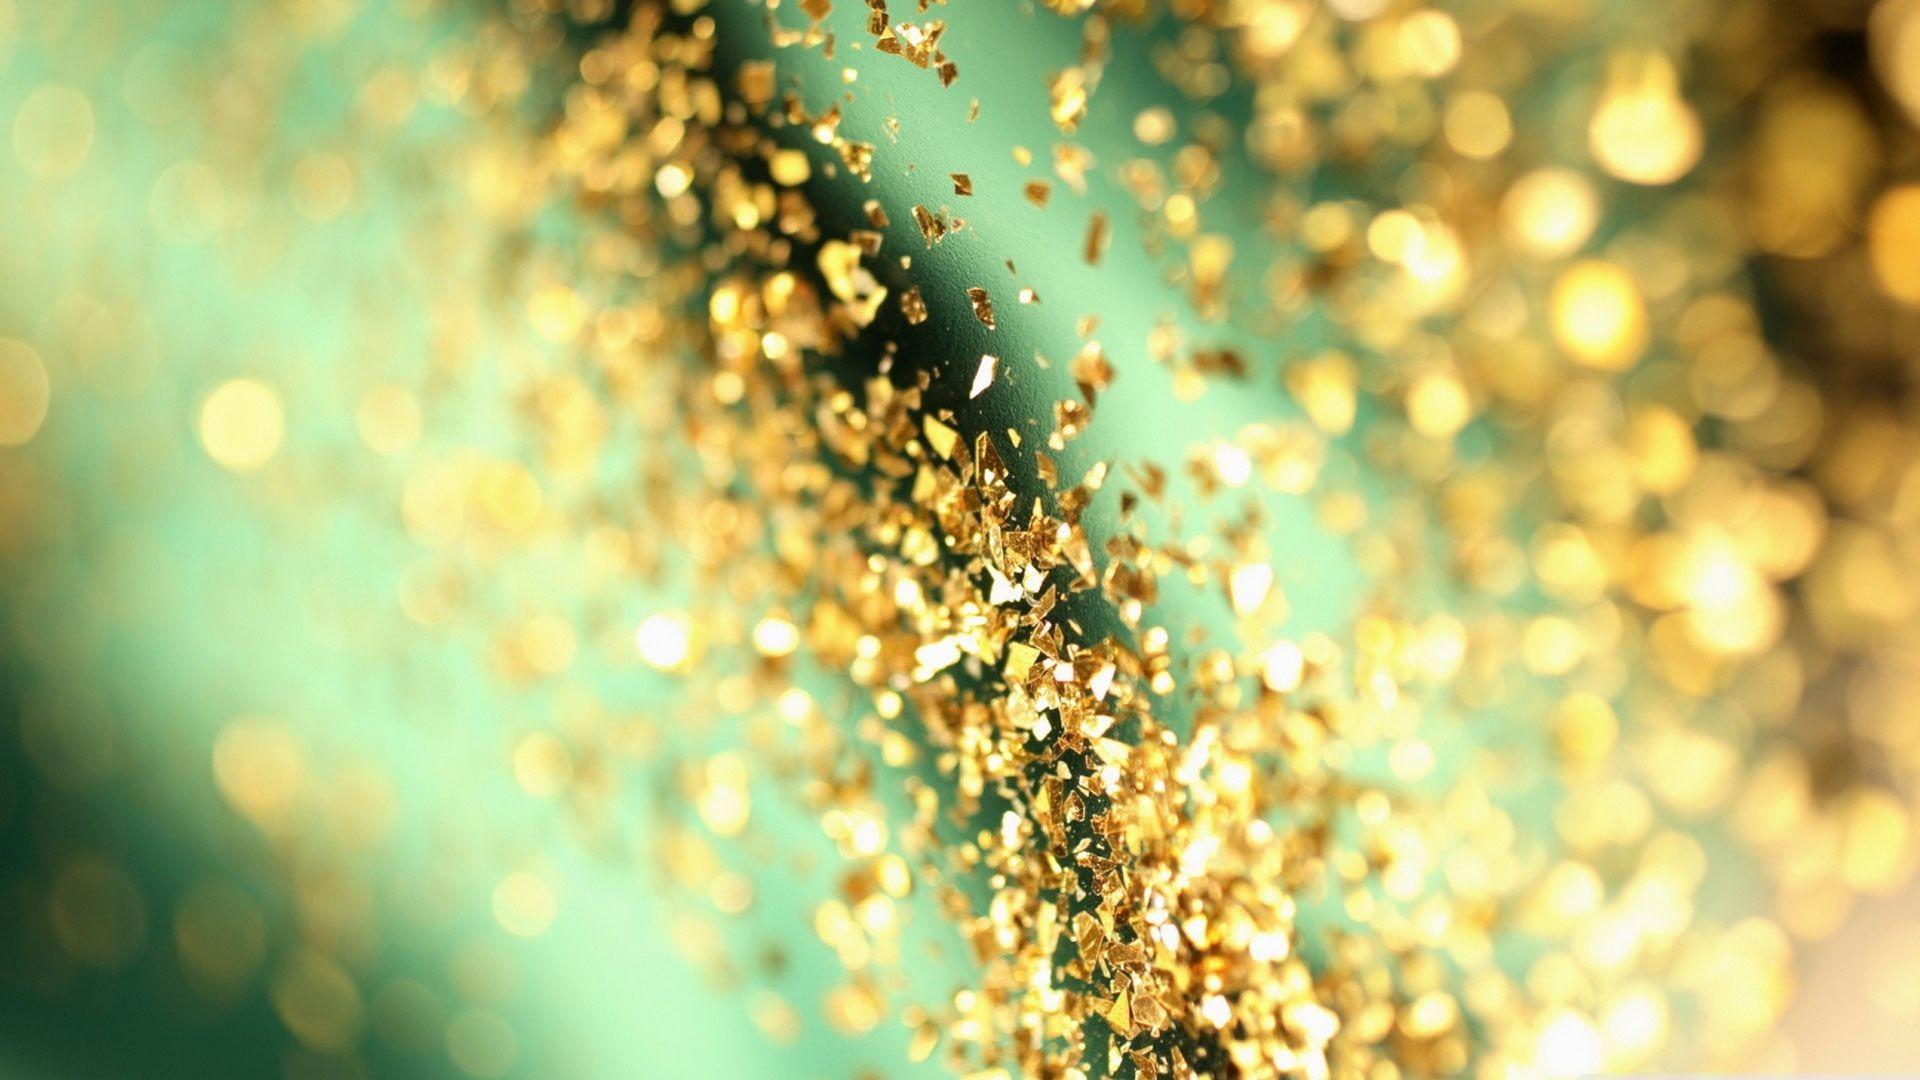 Pin wallpaper glitter friday glitter glitter macros sparkle wallpaper –  Explore Glitter Background Google Play And